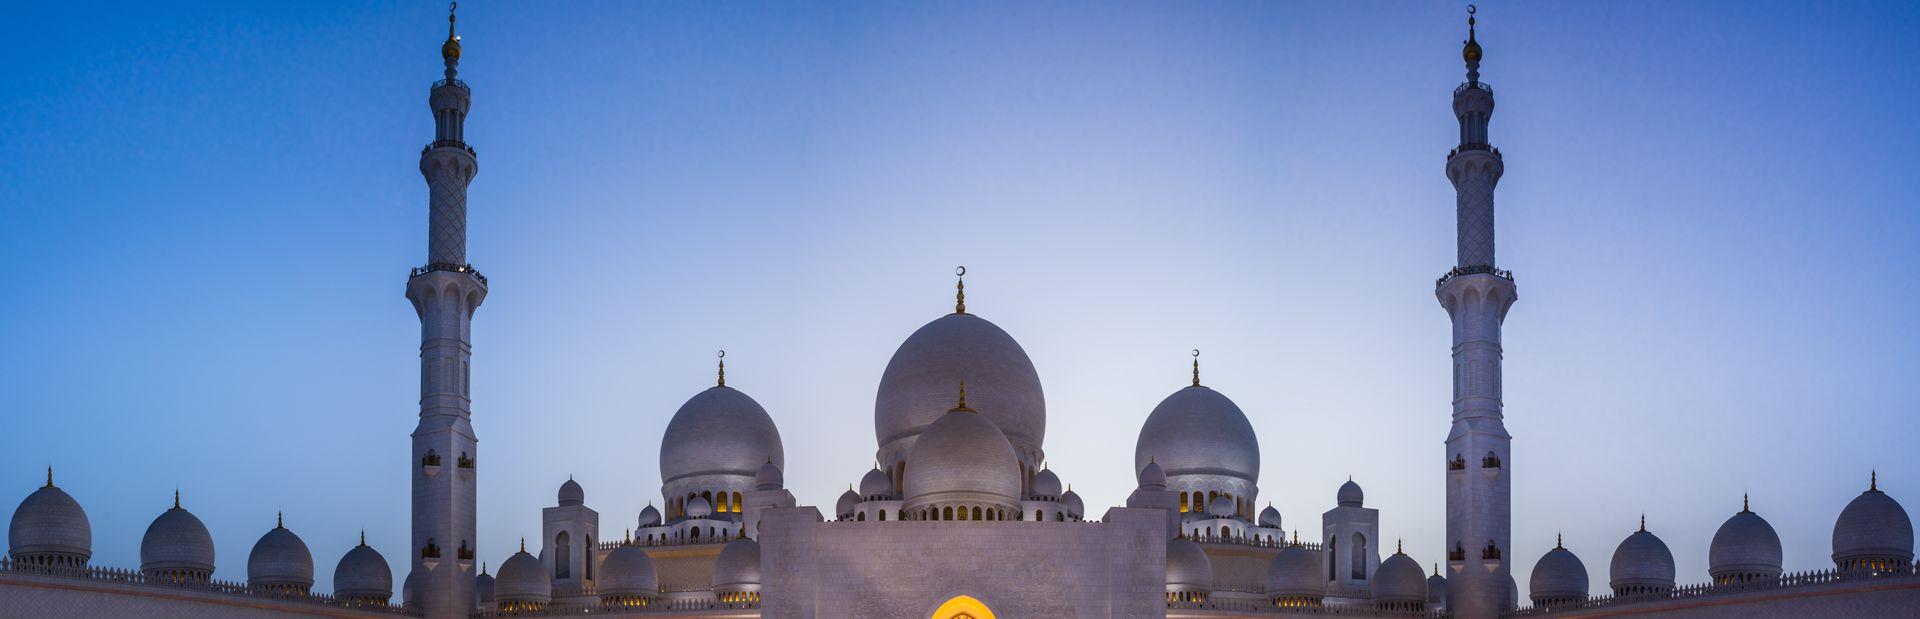 Sheikh Zayed Grand Mosque Image 1